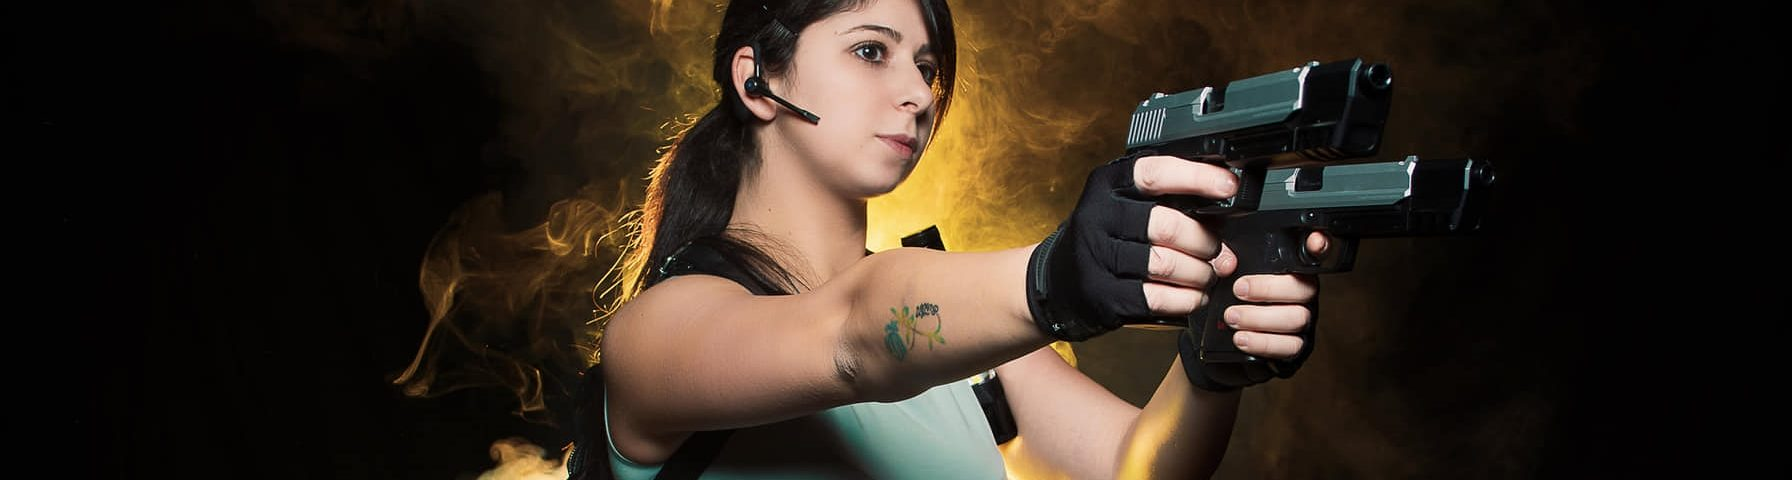 Jeje-Zanella-Lara-Croft-Tomb-Raider-5